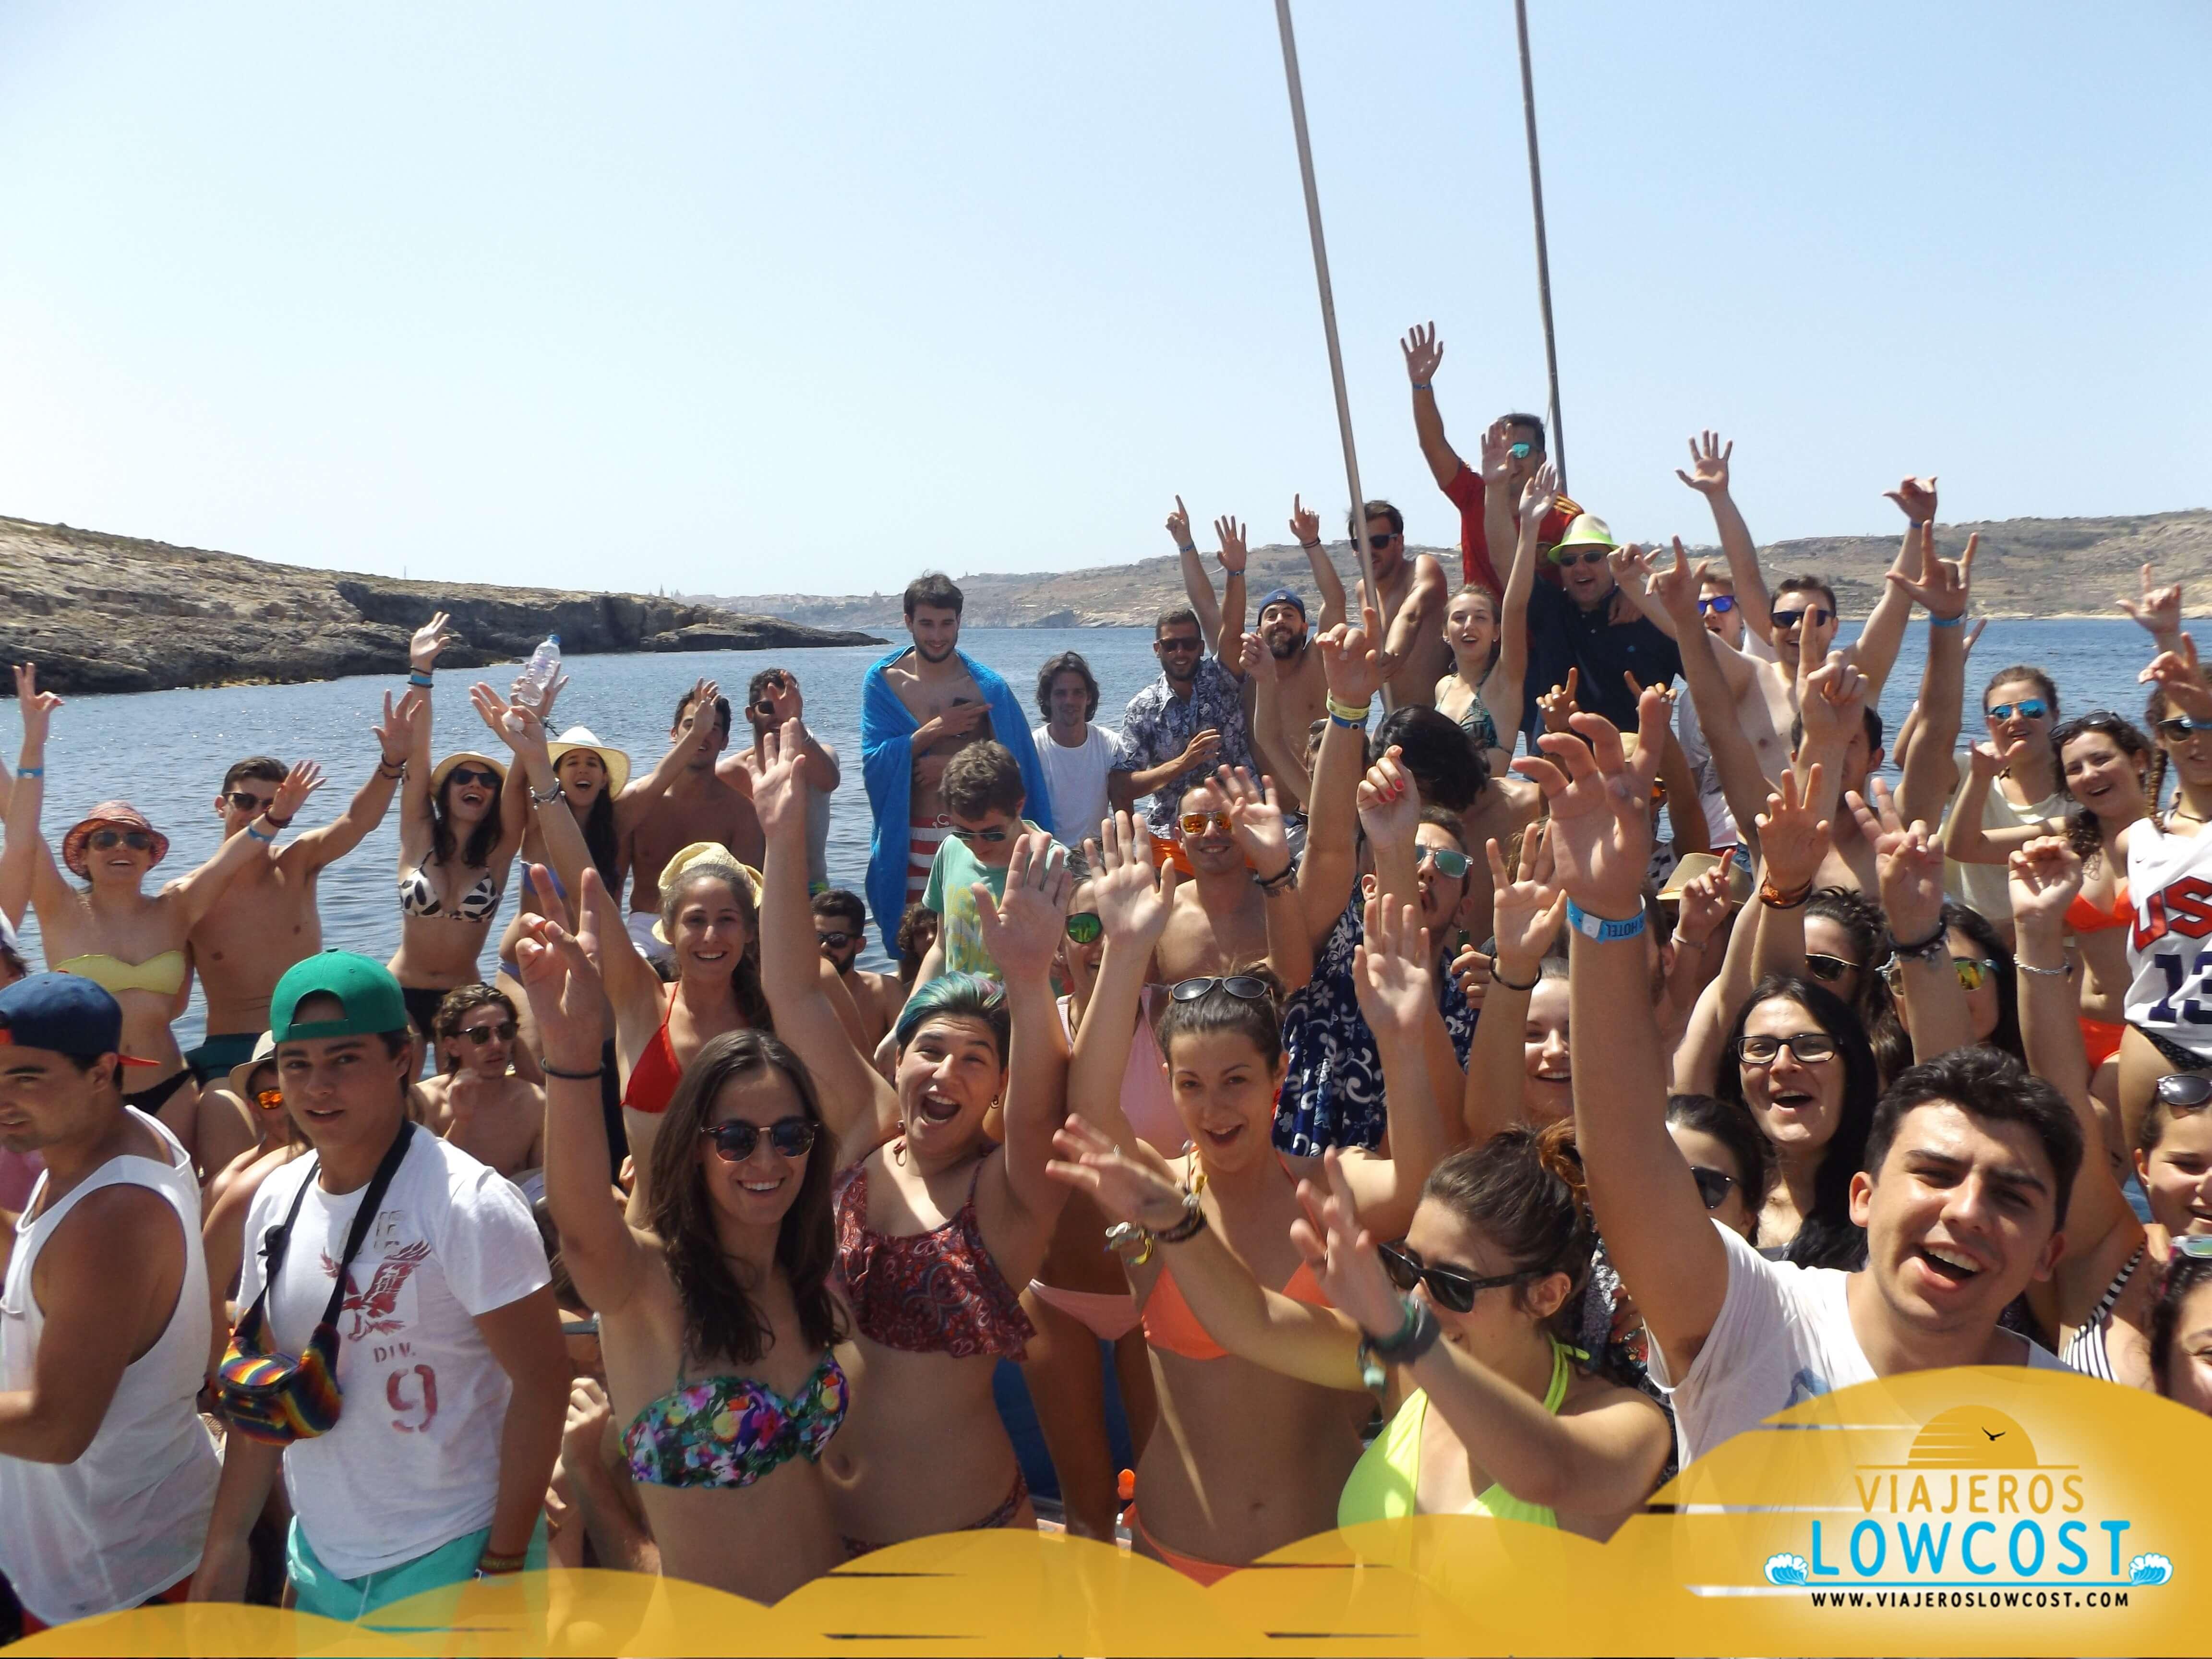 viajes low cost a malta